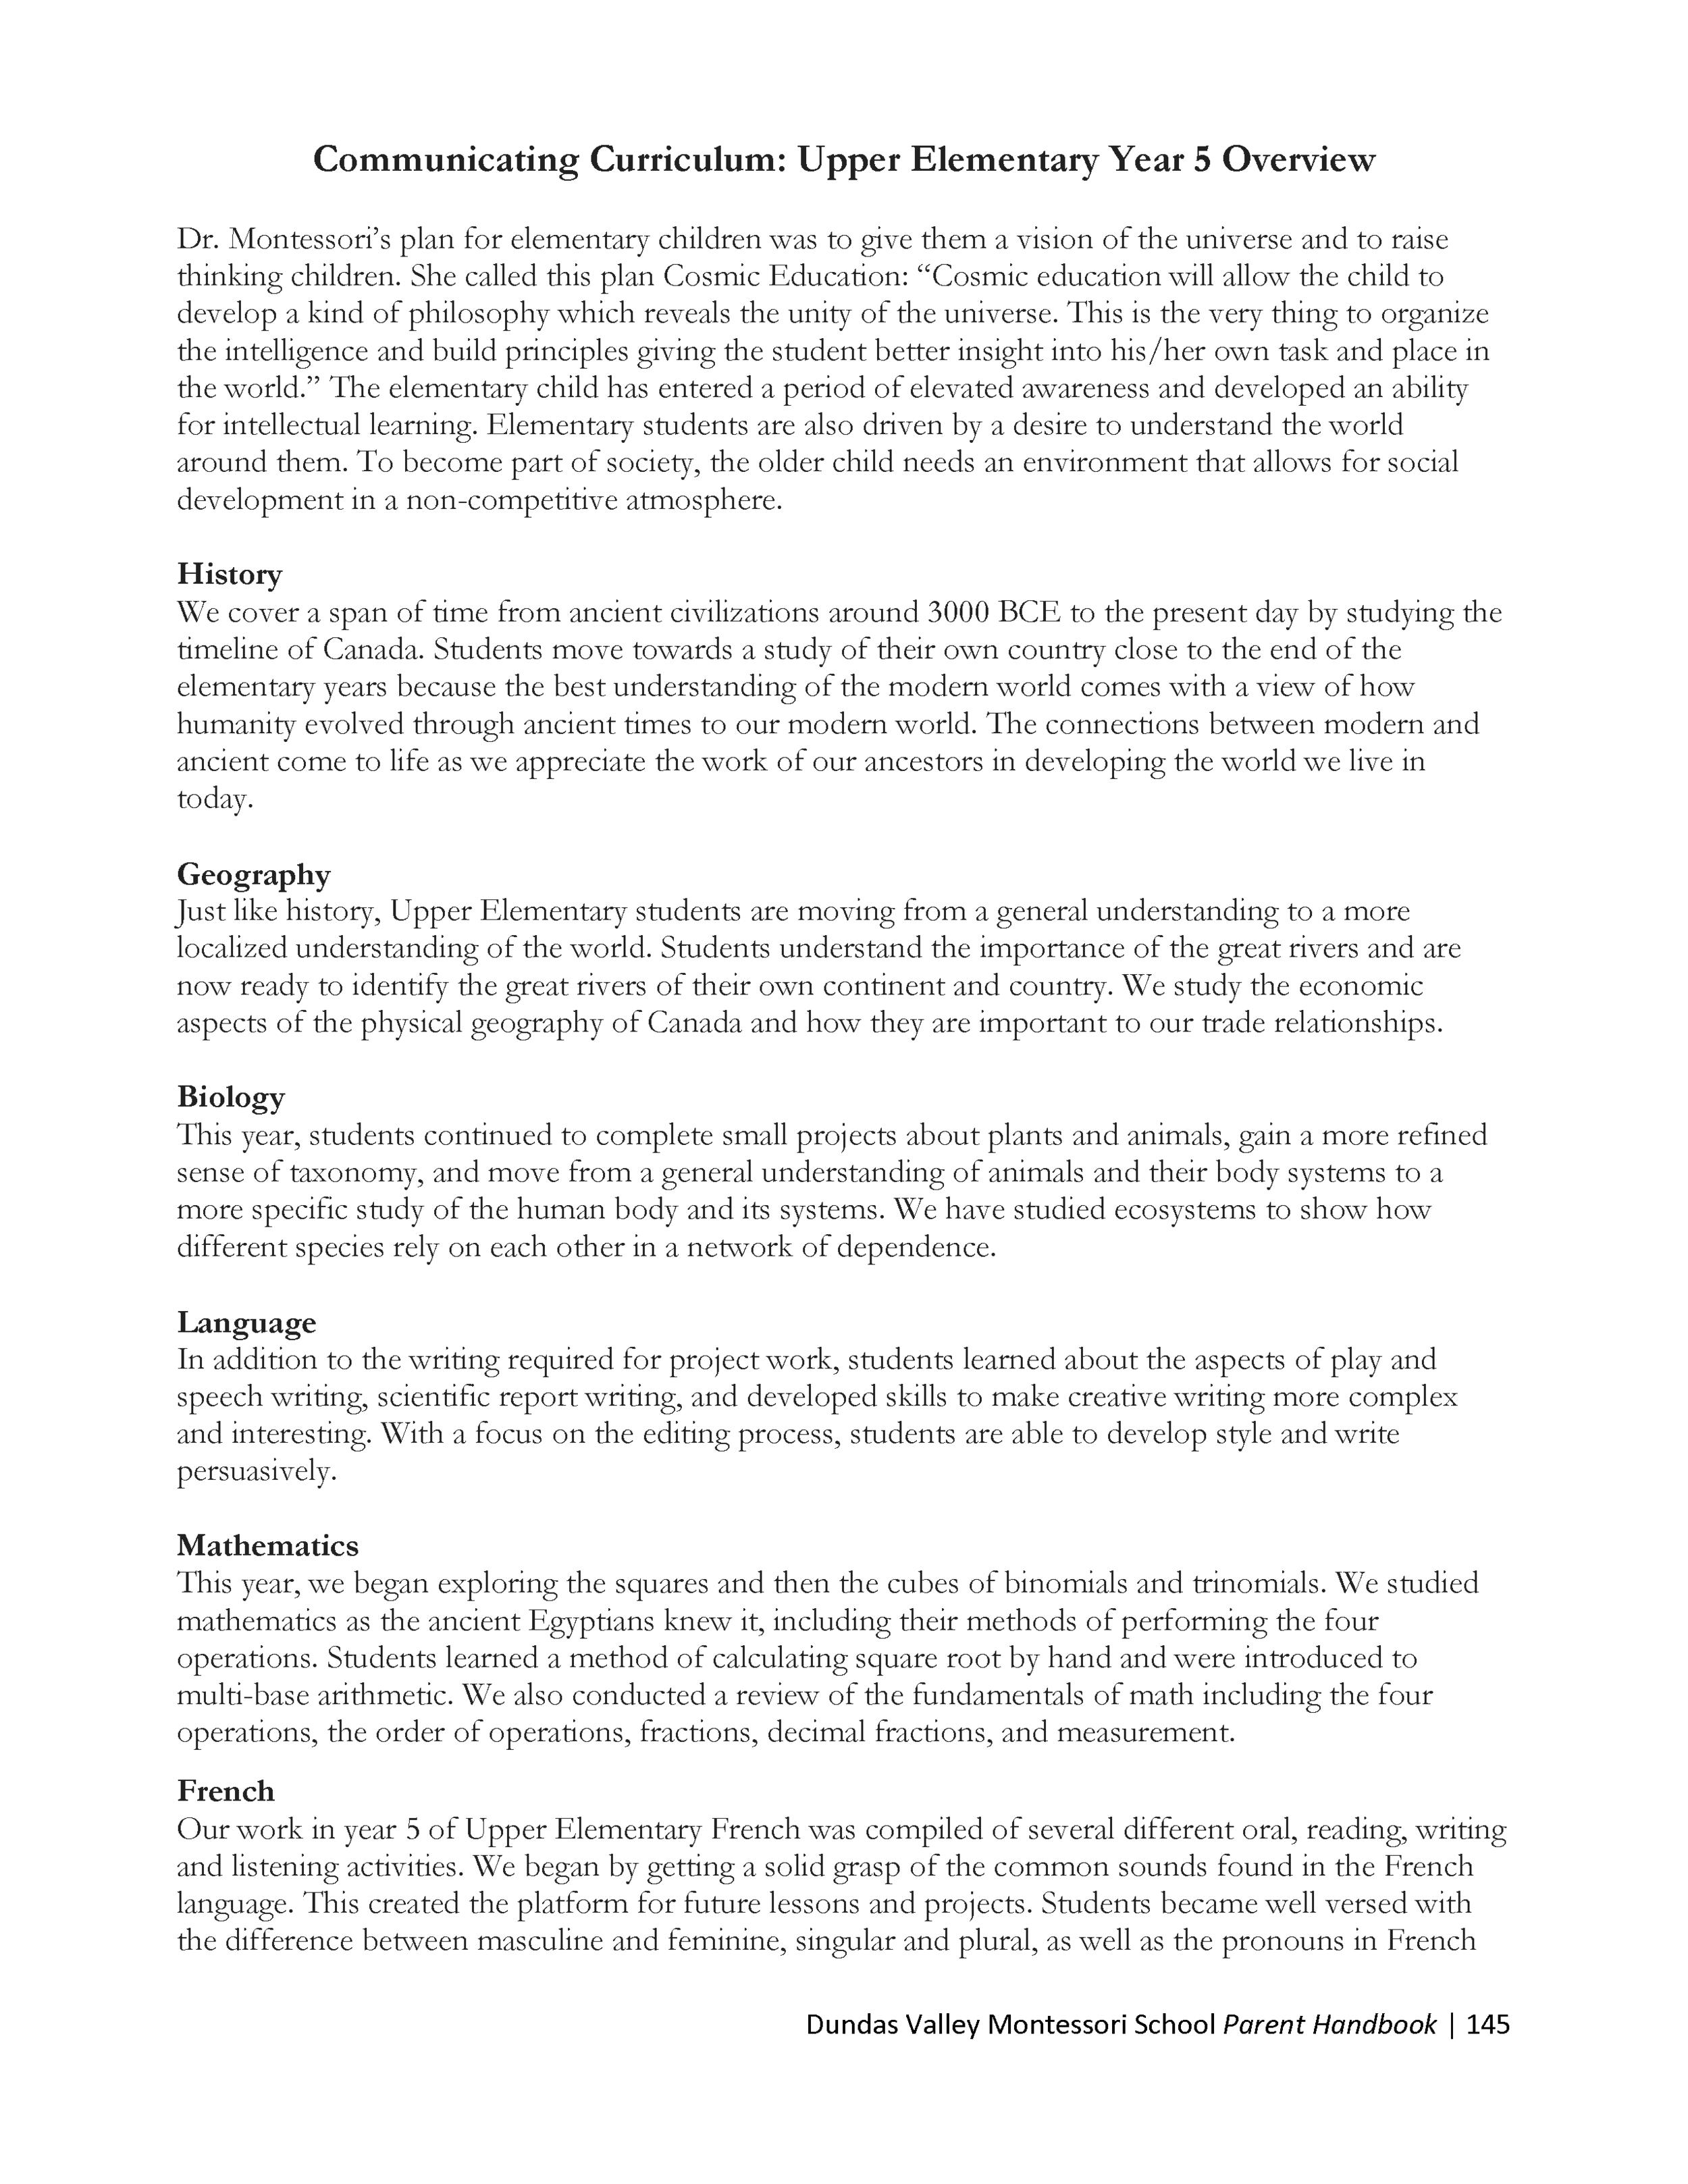 DVMS-Parent-Handbook-19-20_Page_147.png